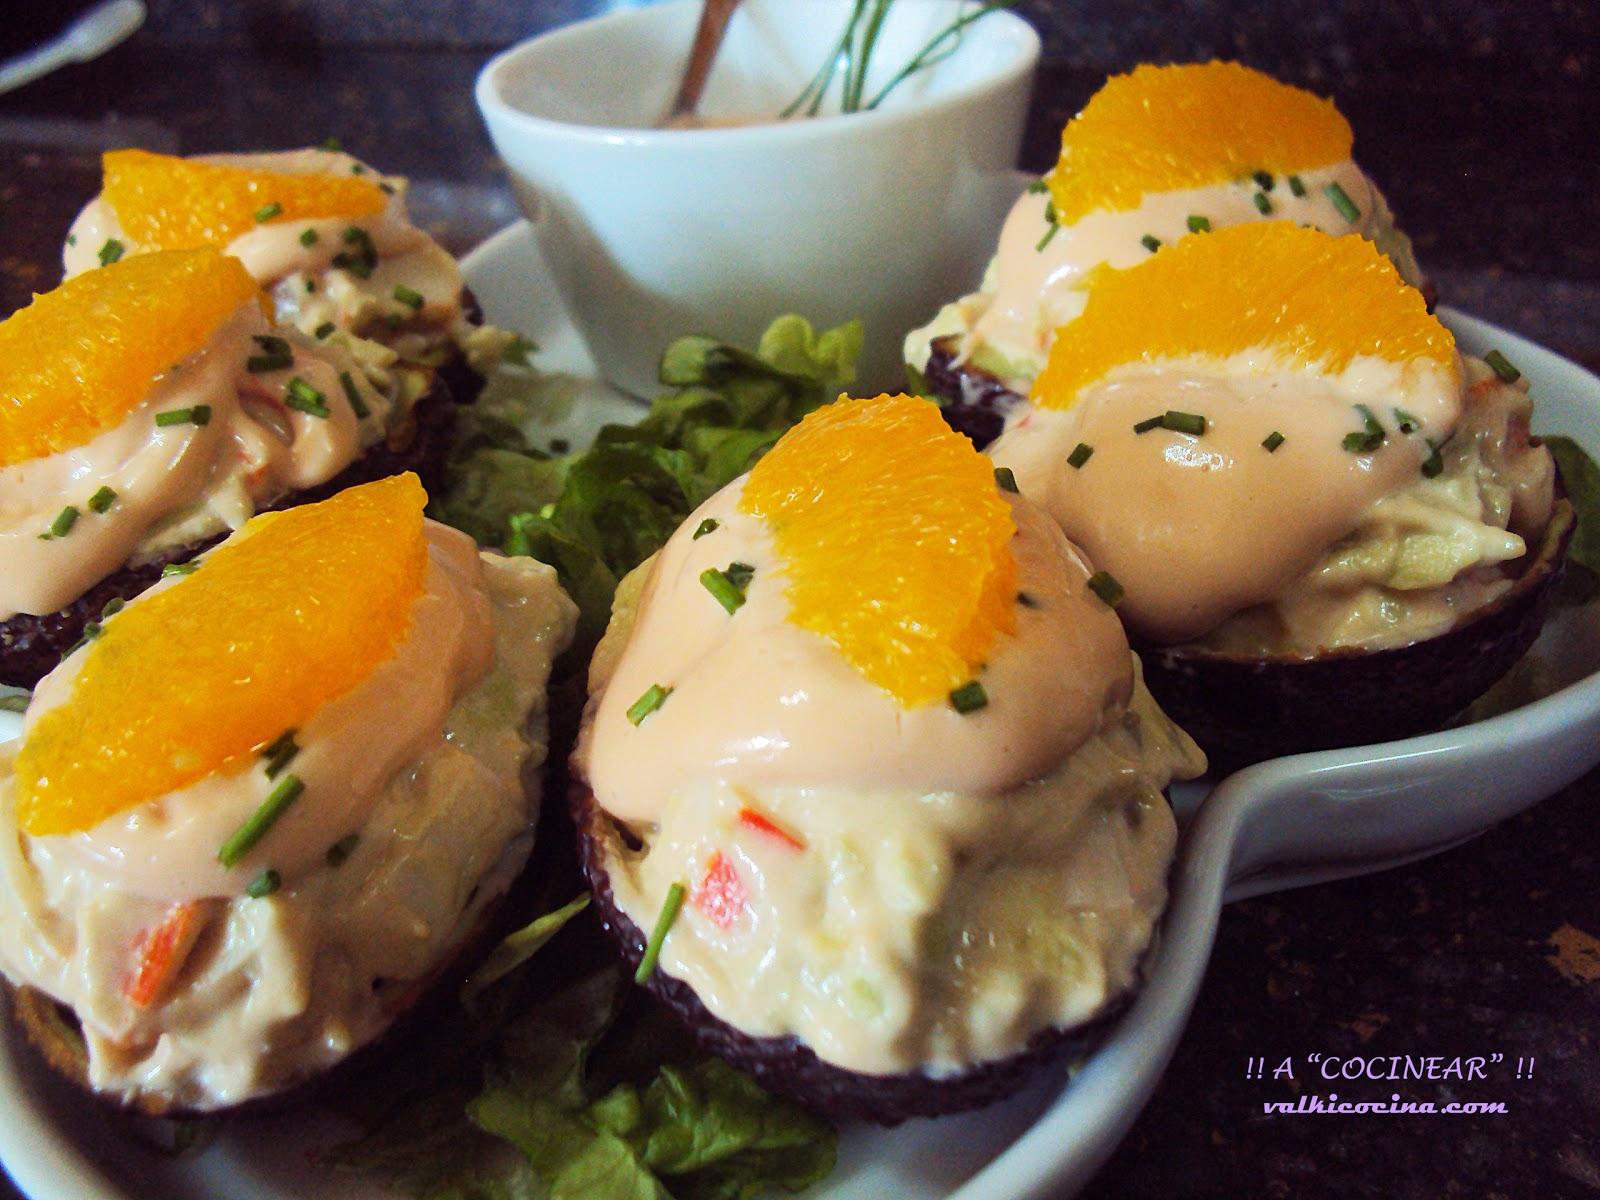 Aguacates rellenos de marisco y piña con salsa rosa